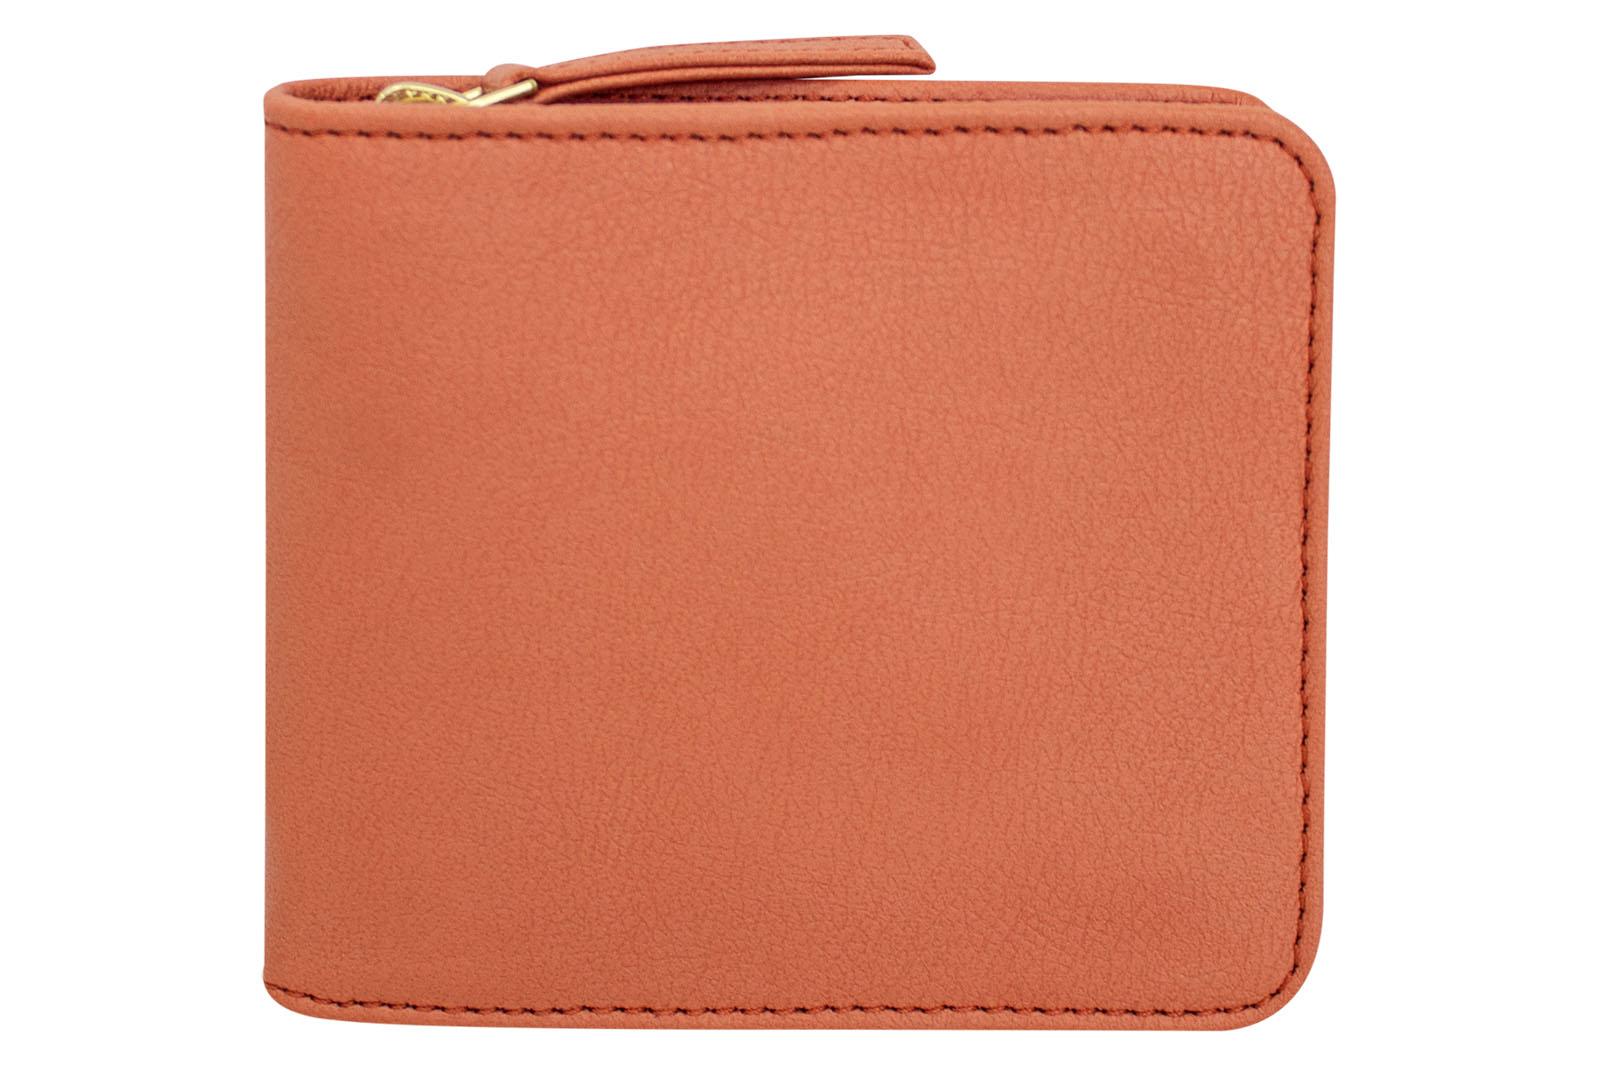 Nuuwai – Portemonnaies aus Apfelleder